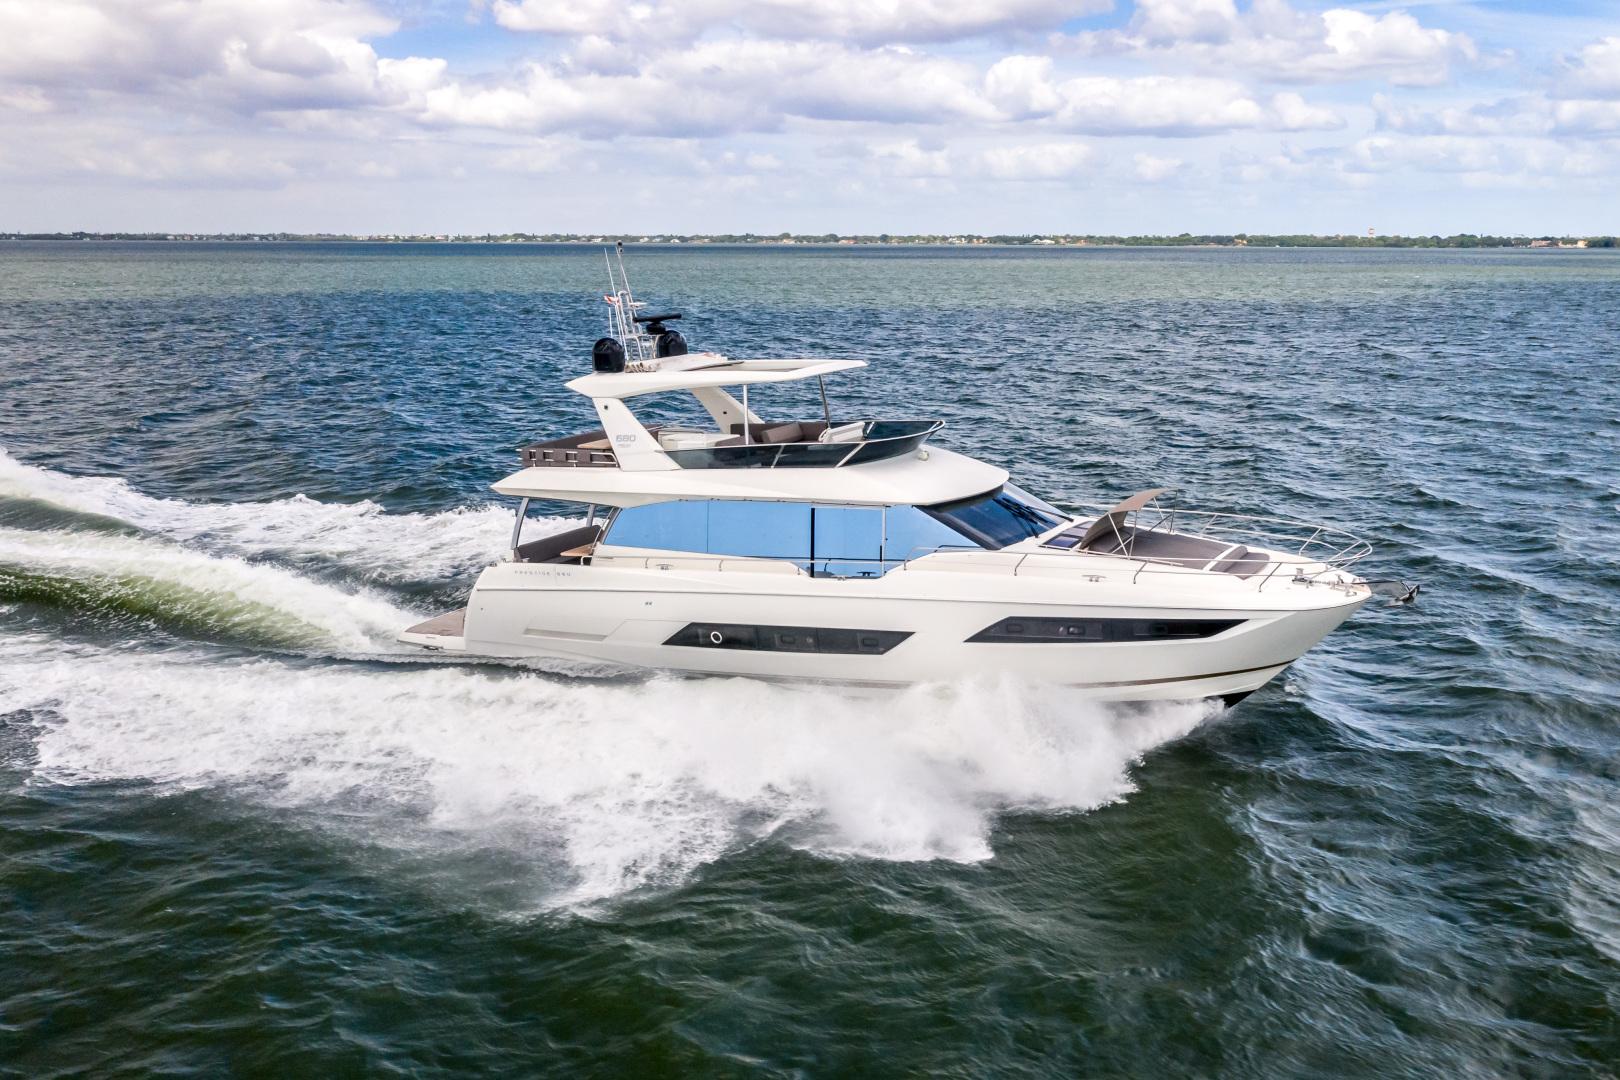 Prestige-680 Flybridge 2018-Seduction Sarasota-Florida-United States-2018 68 Prestige 680 Flybridge  Running Profile-1499104 | Thumbnail